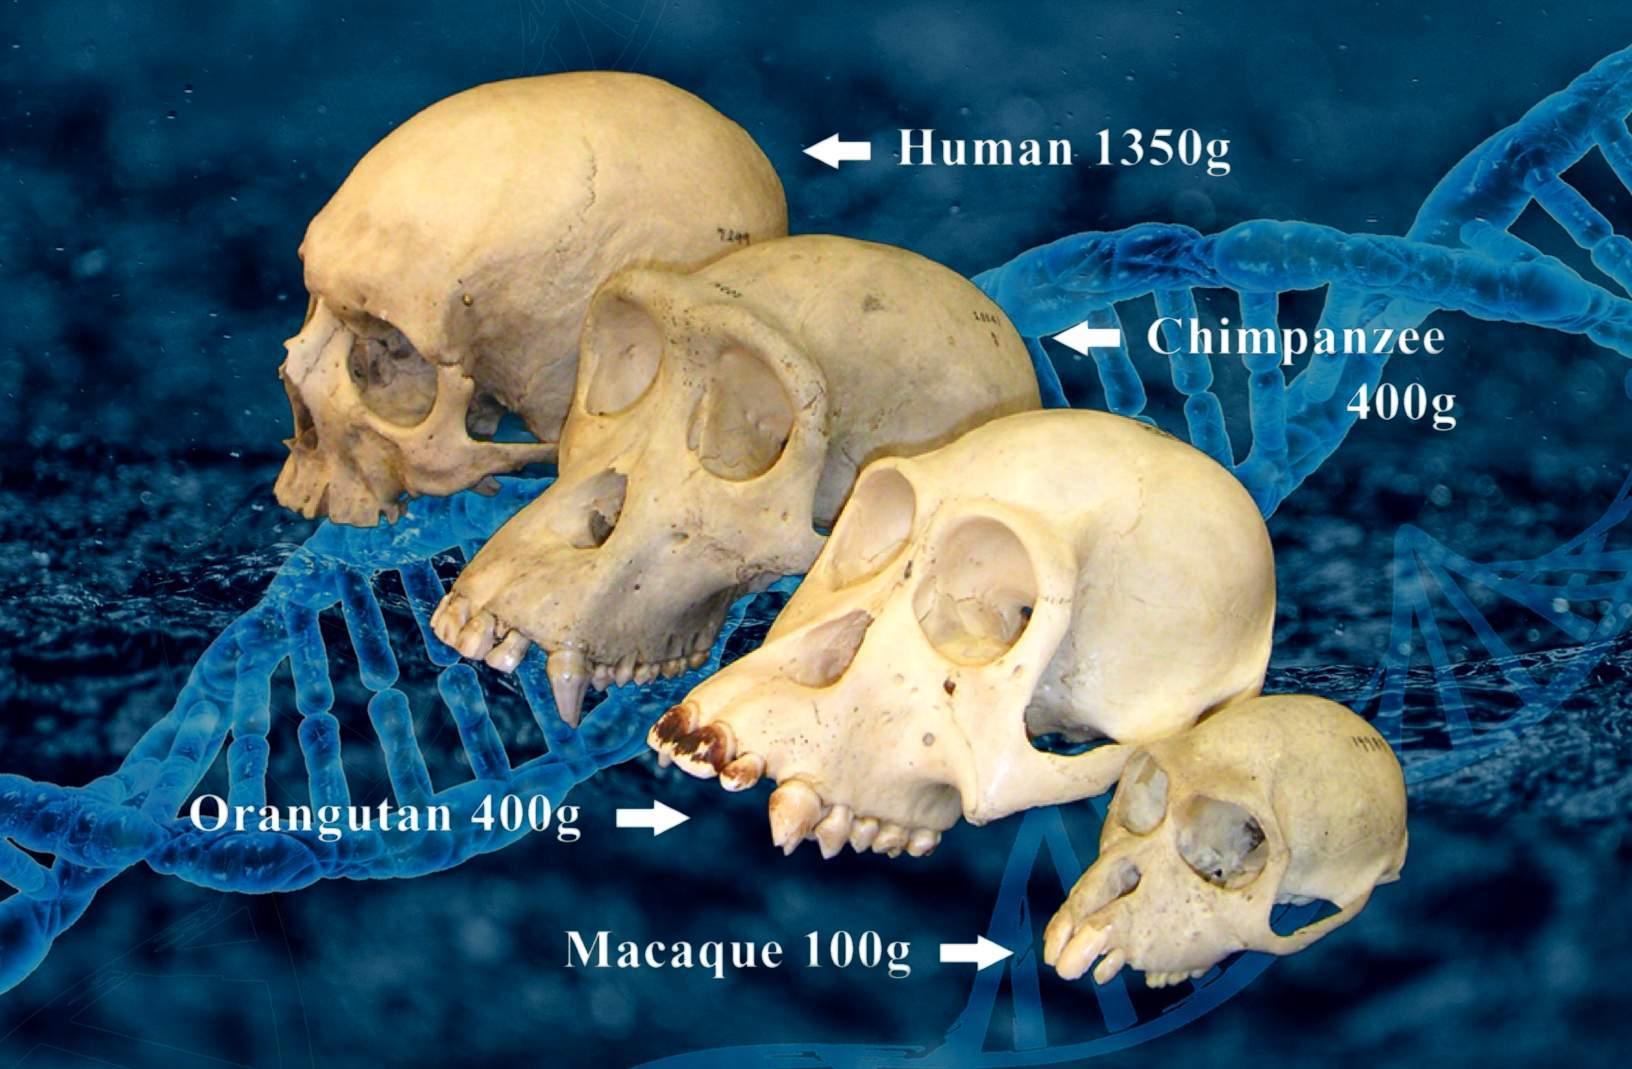 Primate skulls and human skull